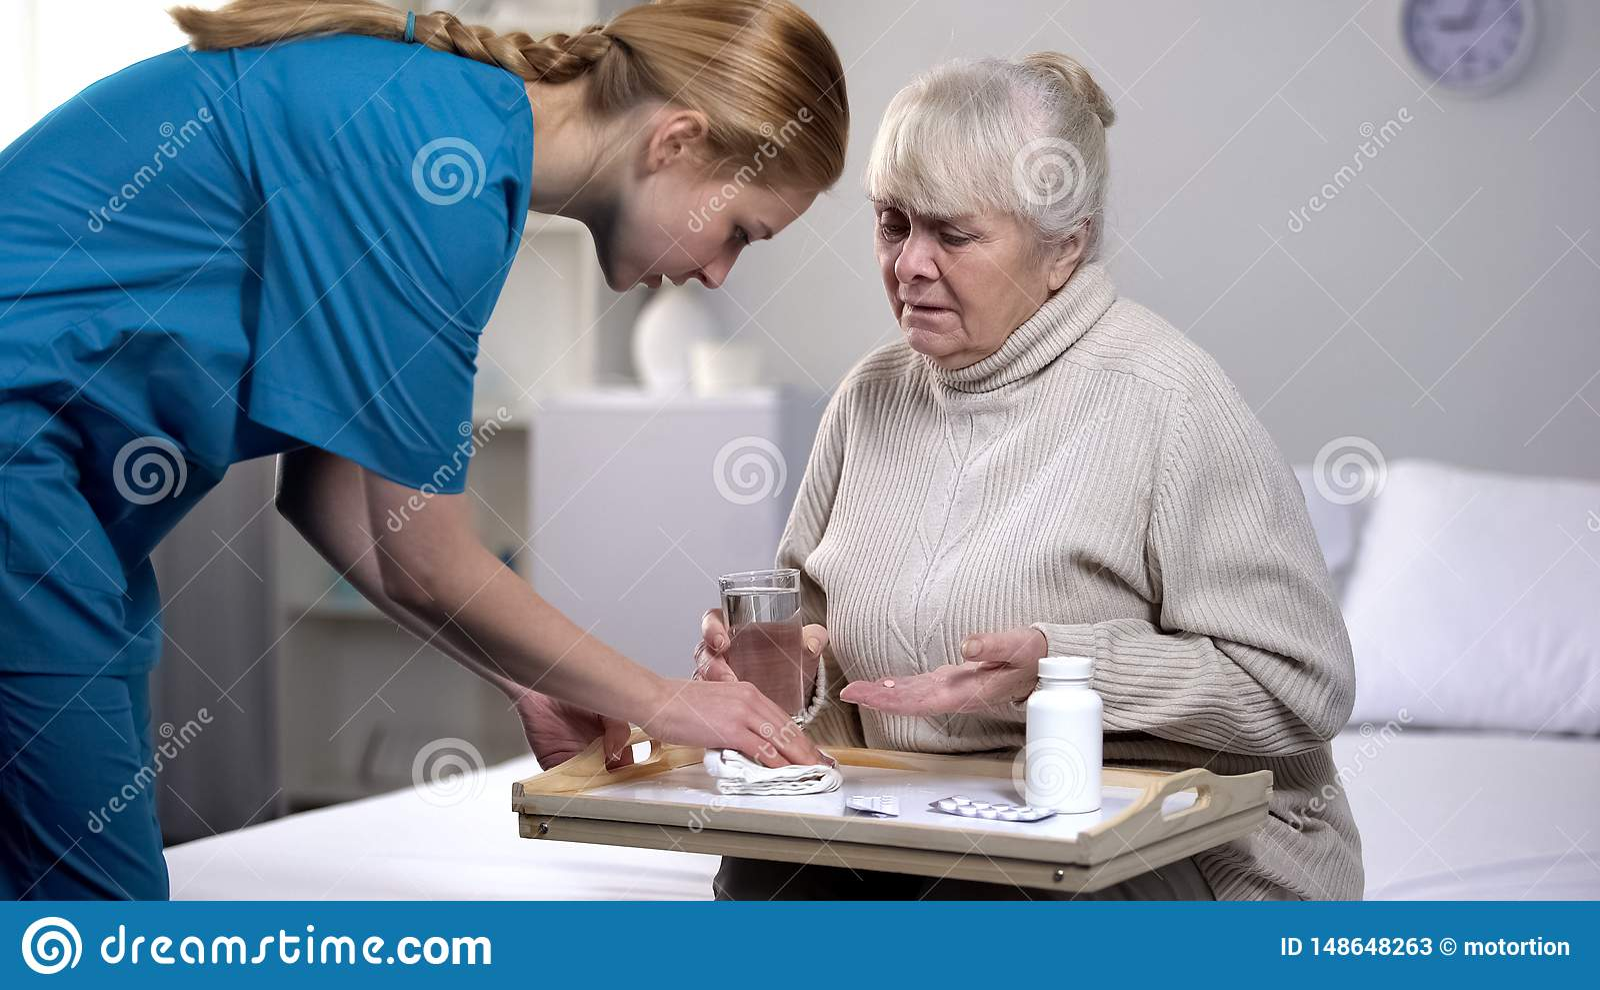 ?ldre kvinnlig patient som spiller vatten p? magasinet, medan ta piller, d?lig service